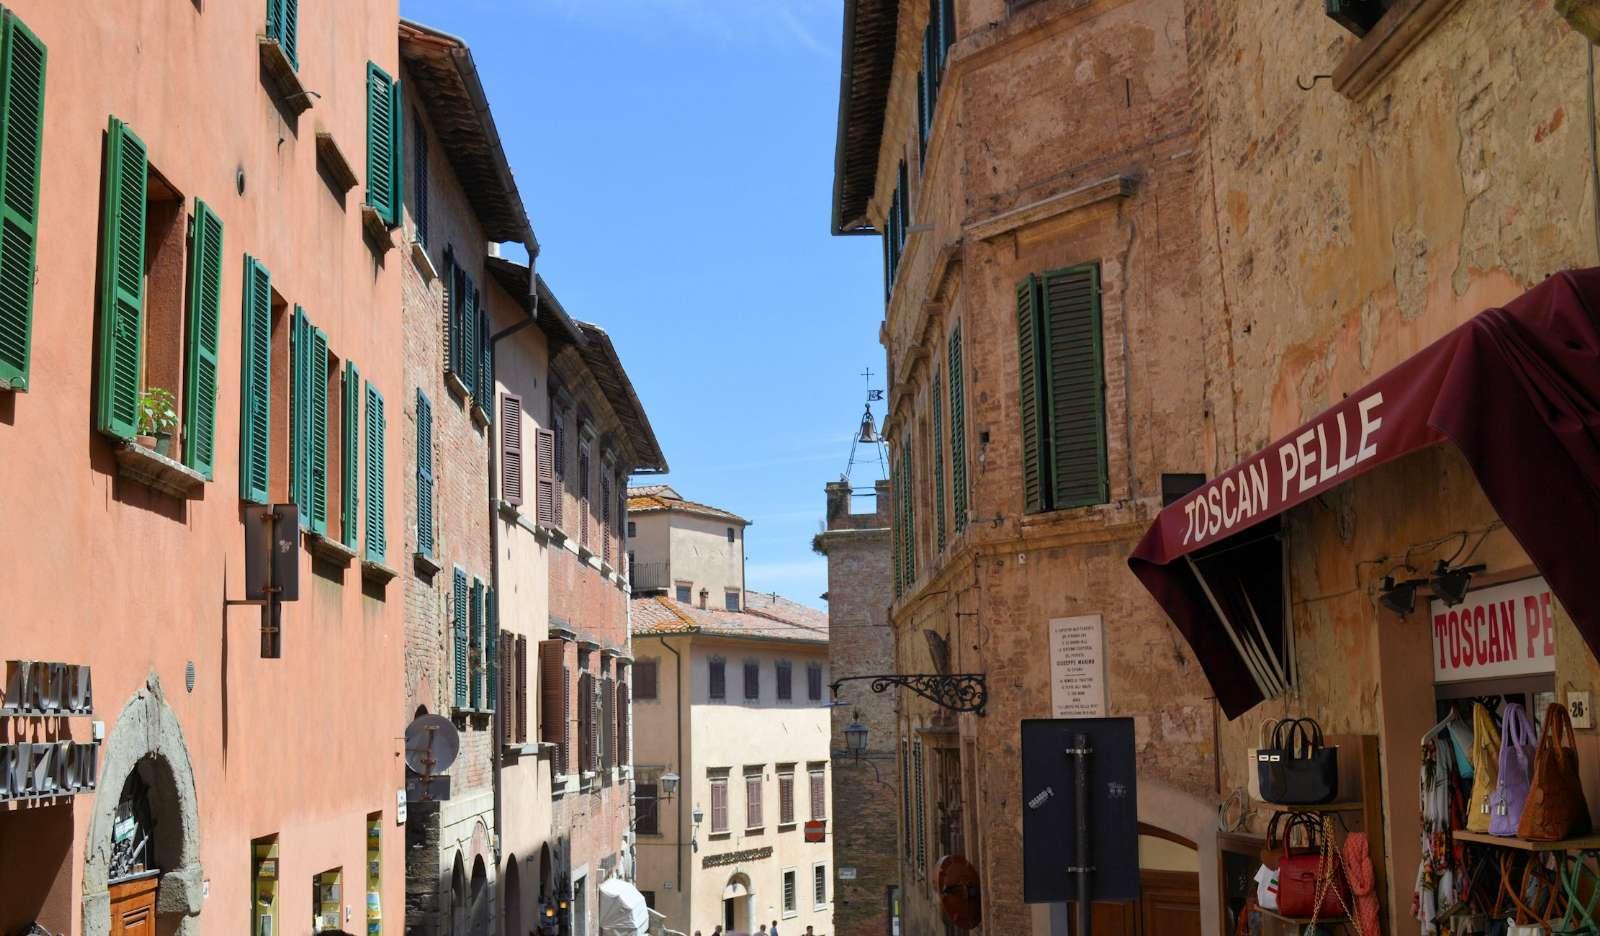 Gadebillede fra Montepulciano